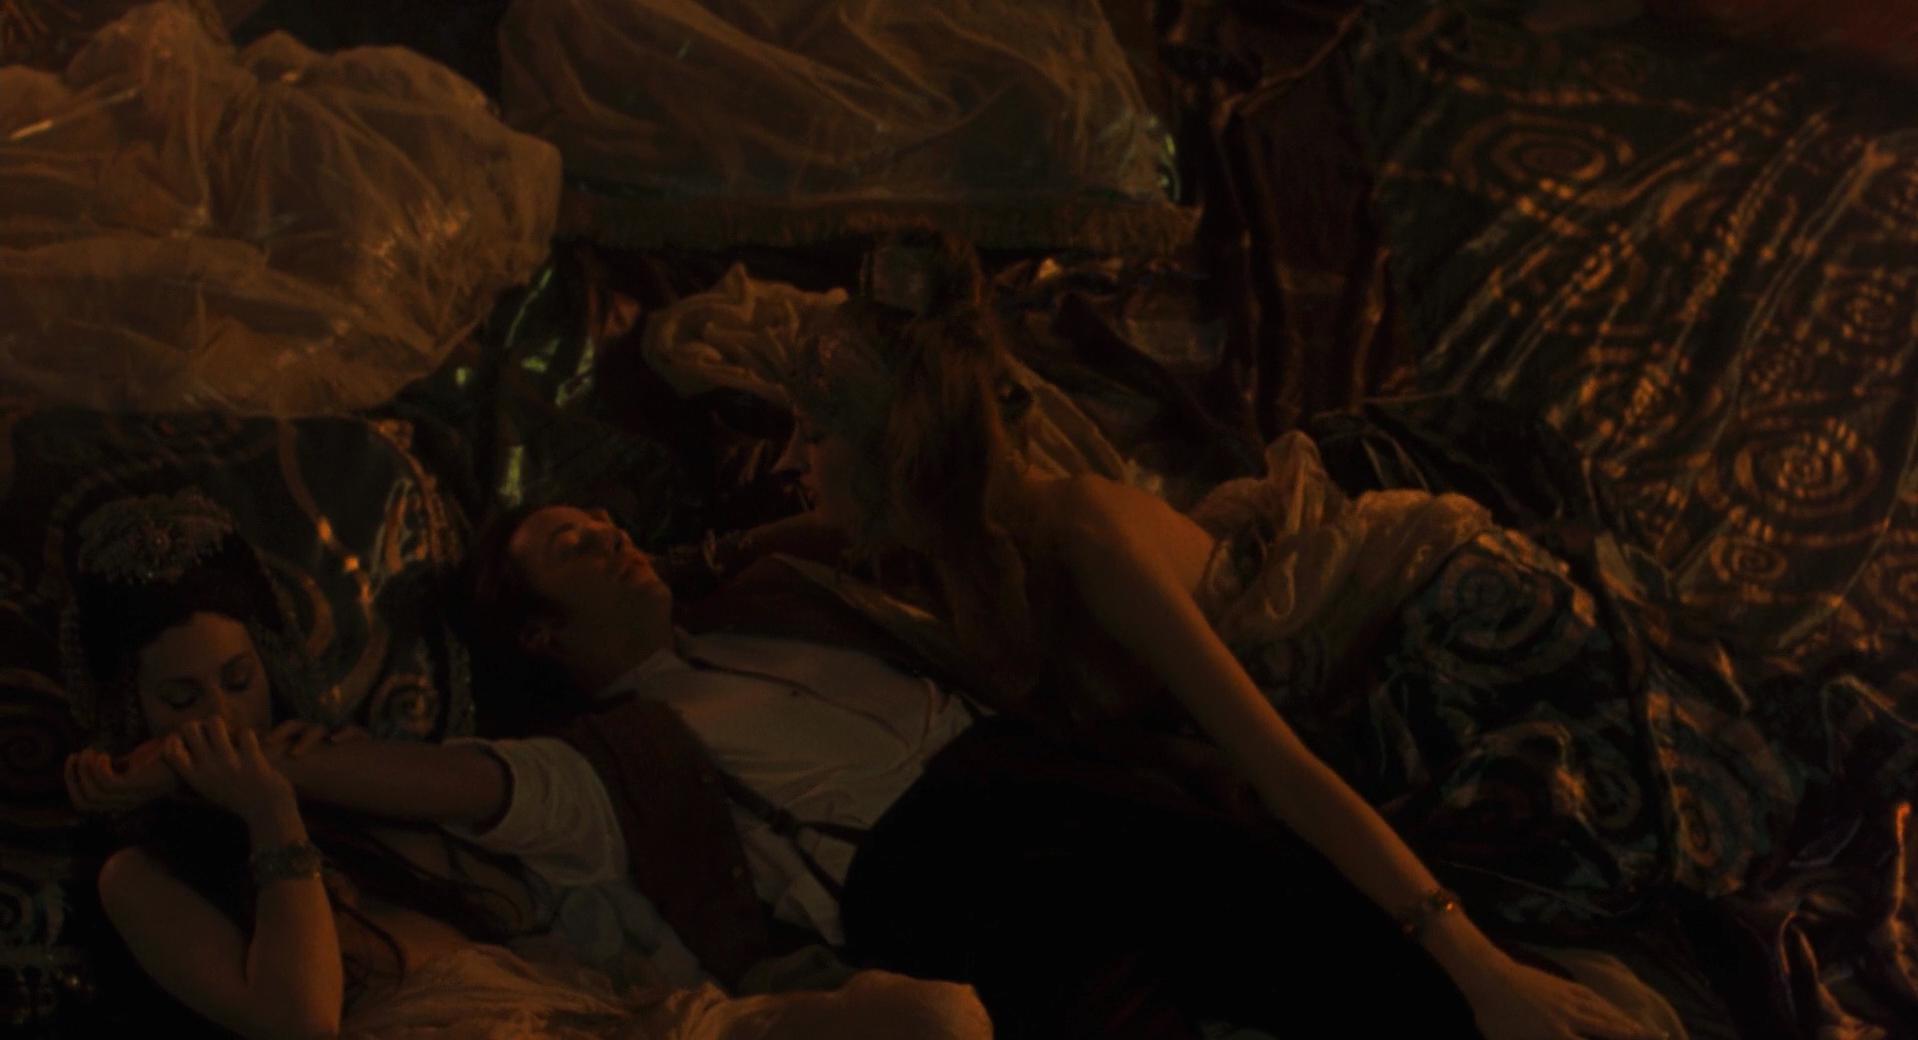 Monica Bellucci nude - underwearm Stoker's Dracula (1992)